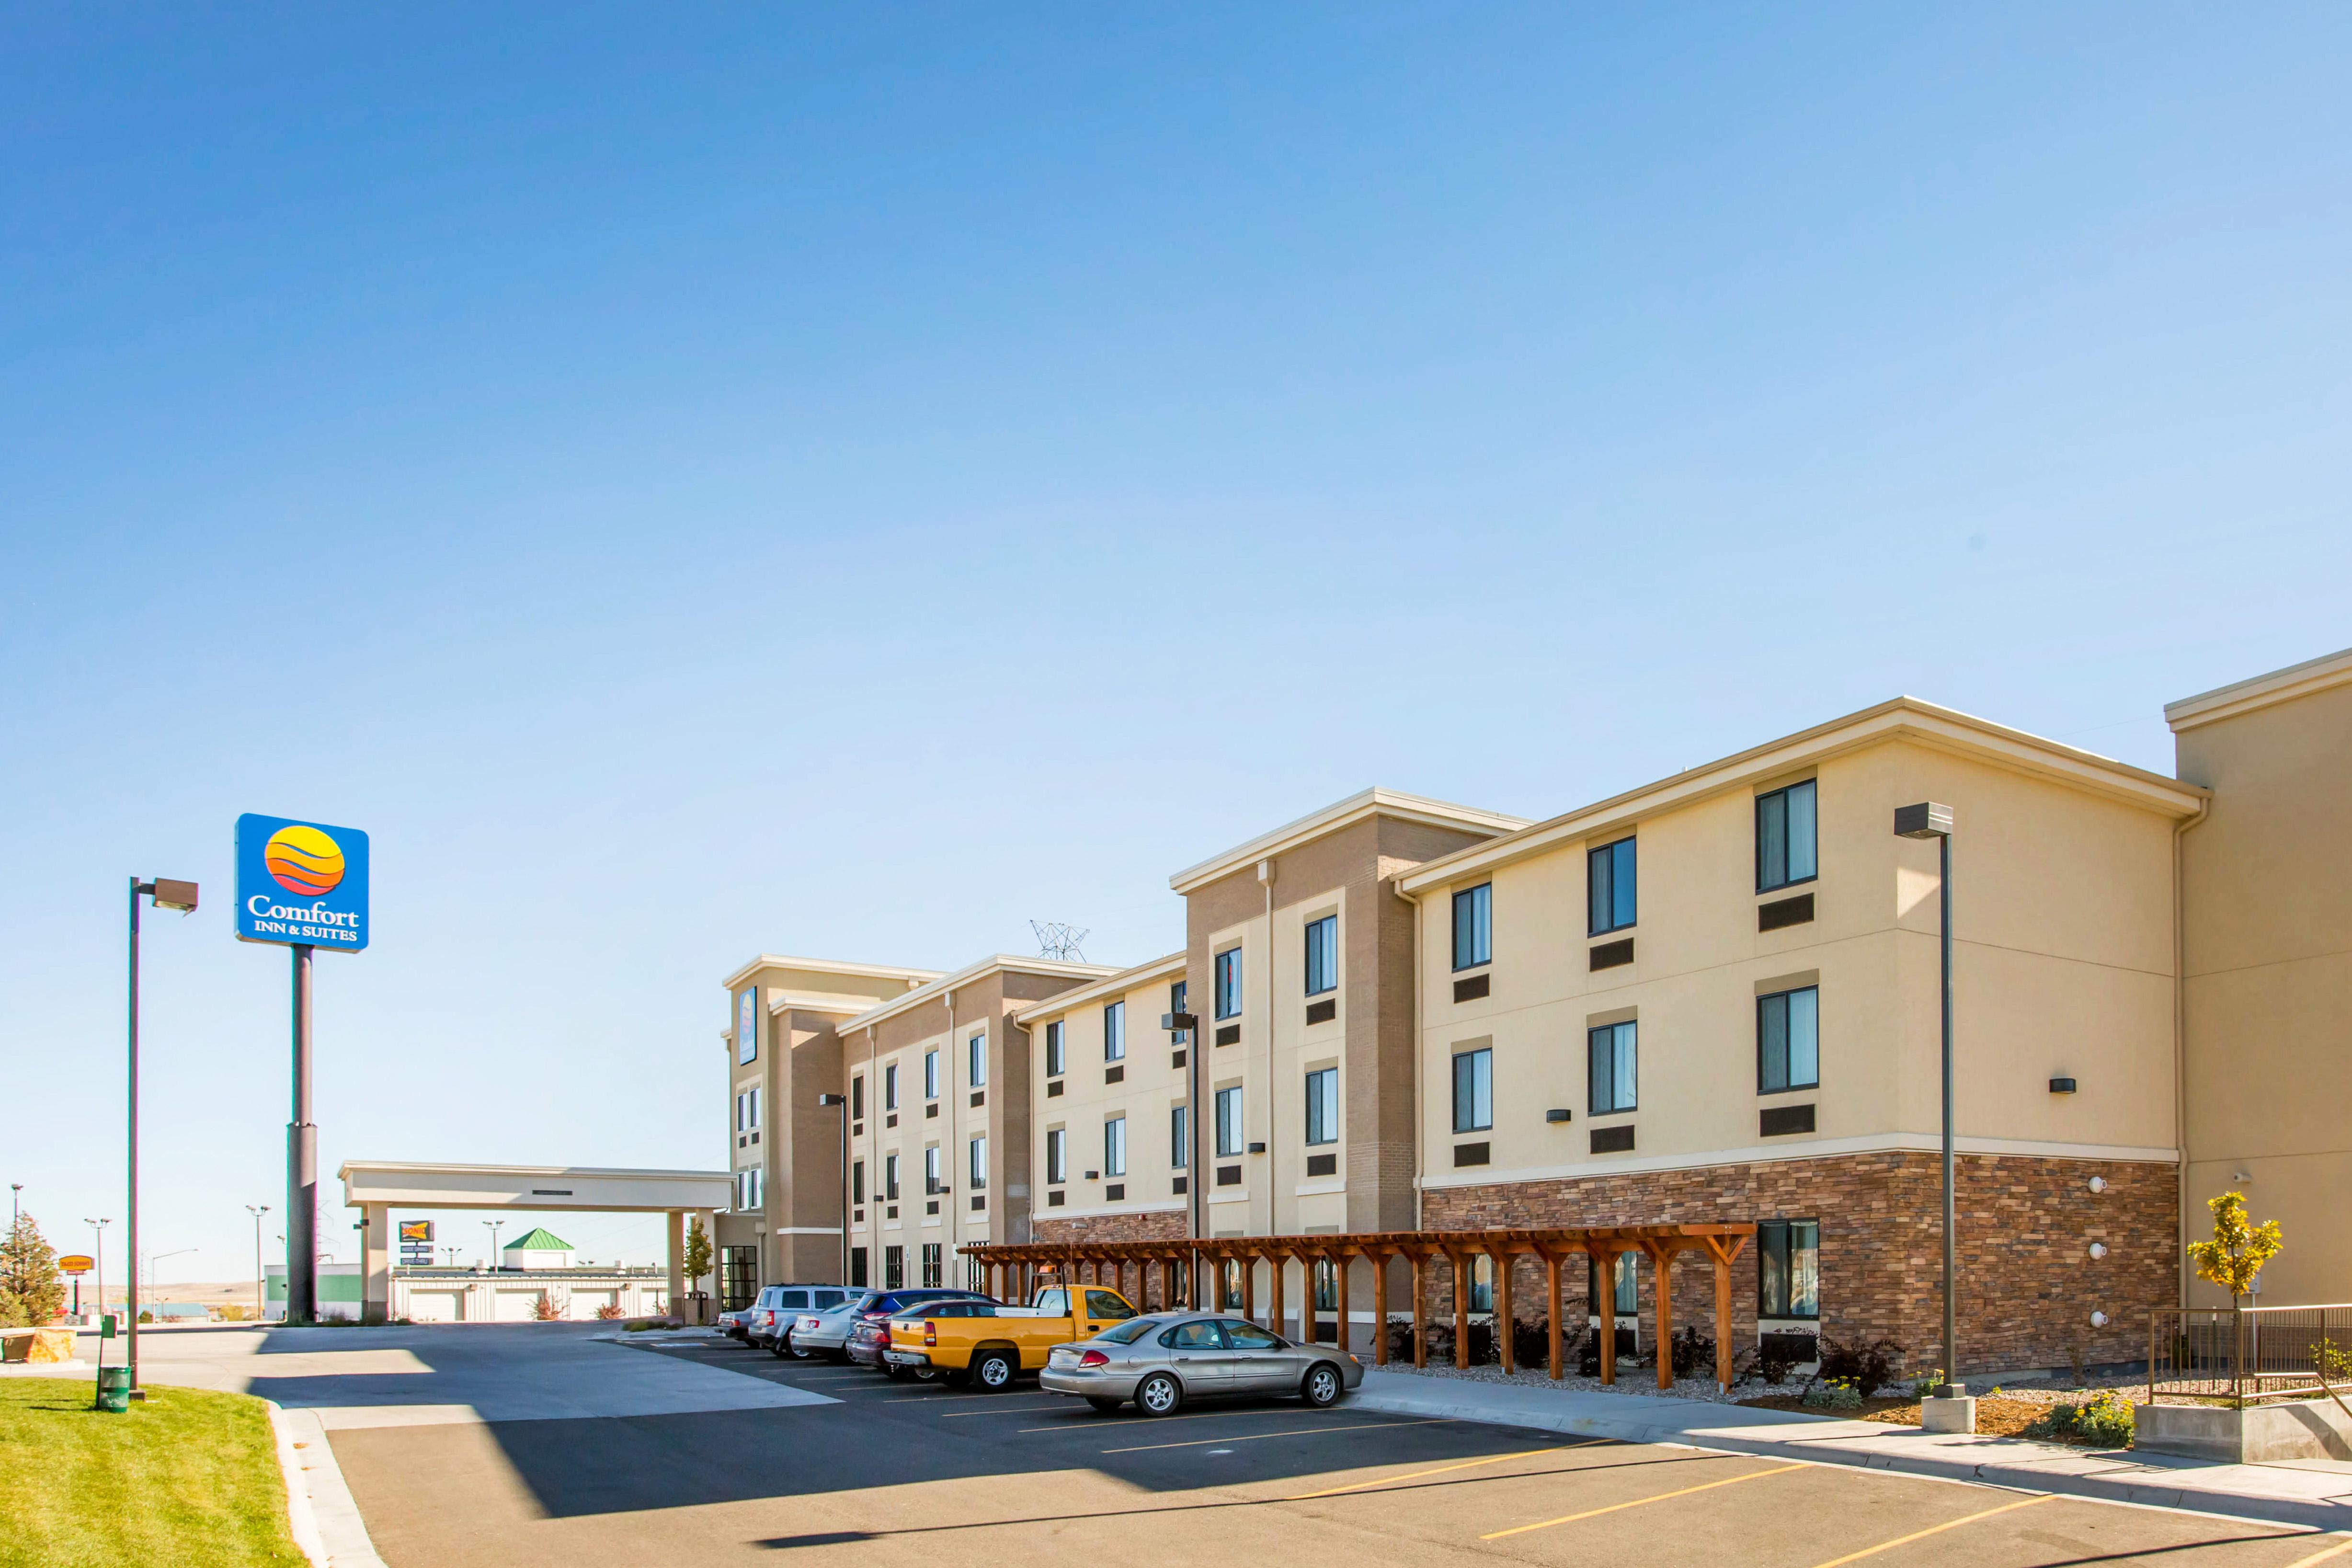 Comfort Inn & Suites, Cheyenne WY